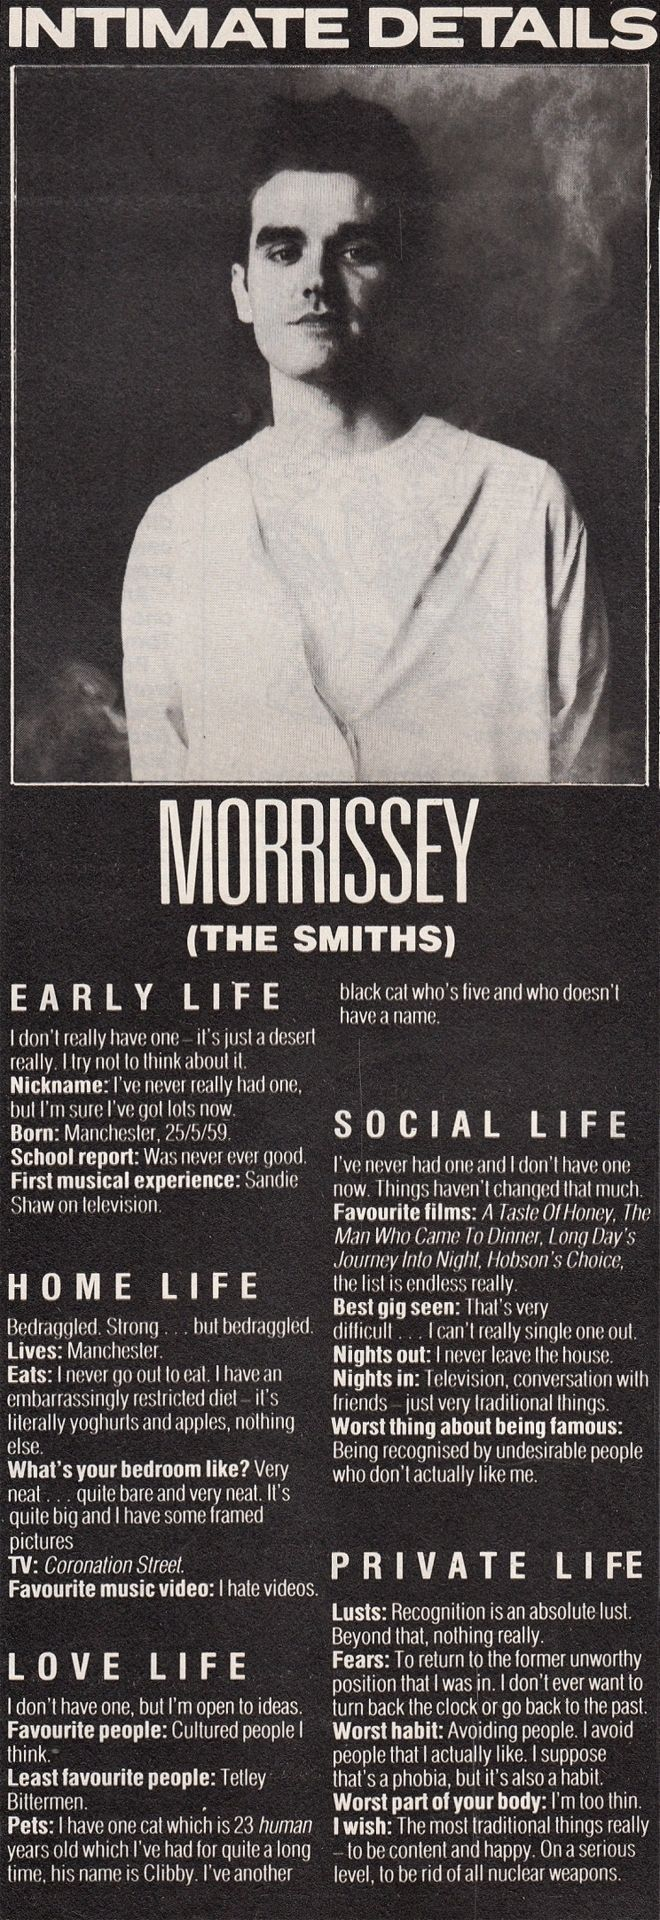 #morrissey this is so fantastic @livia